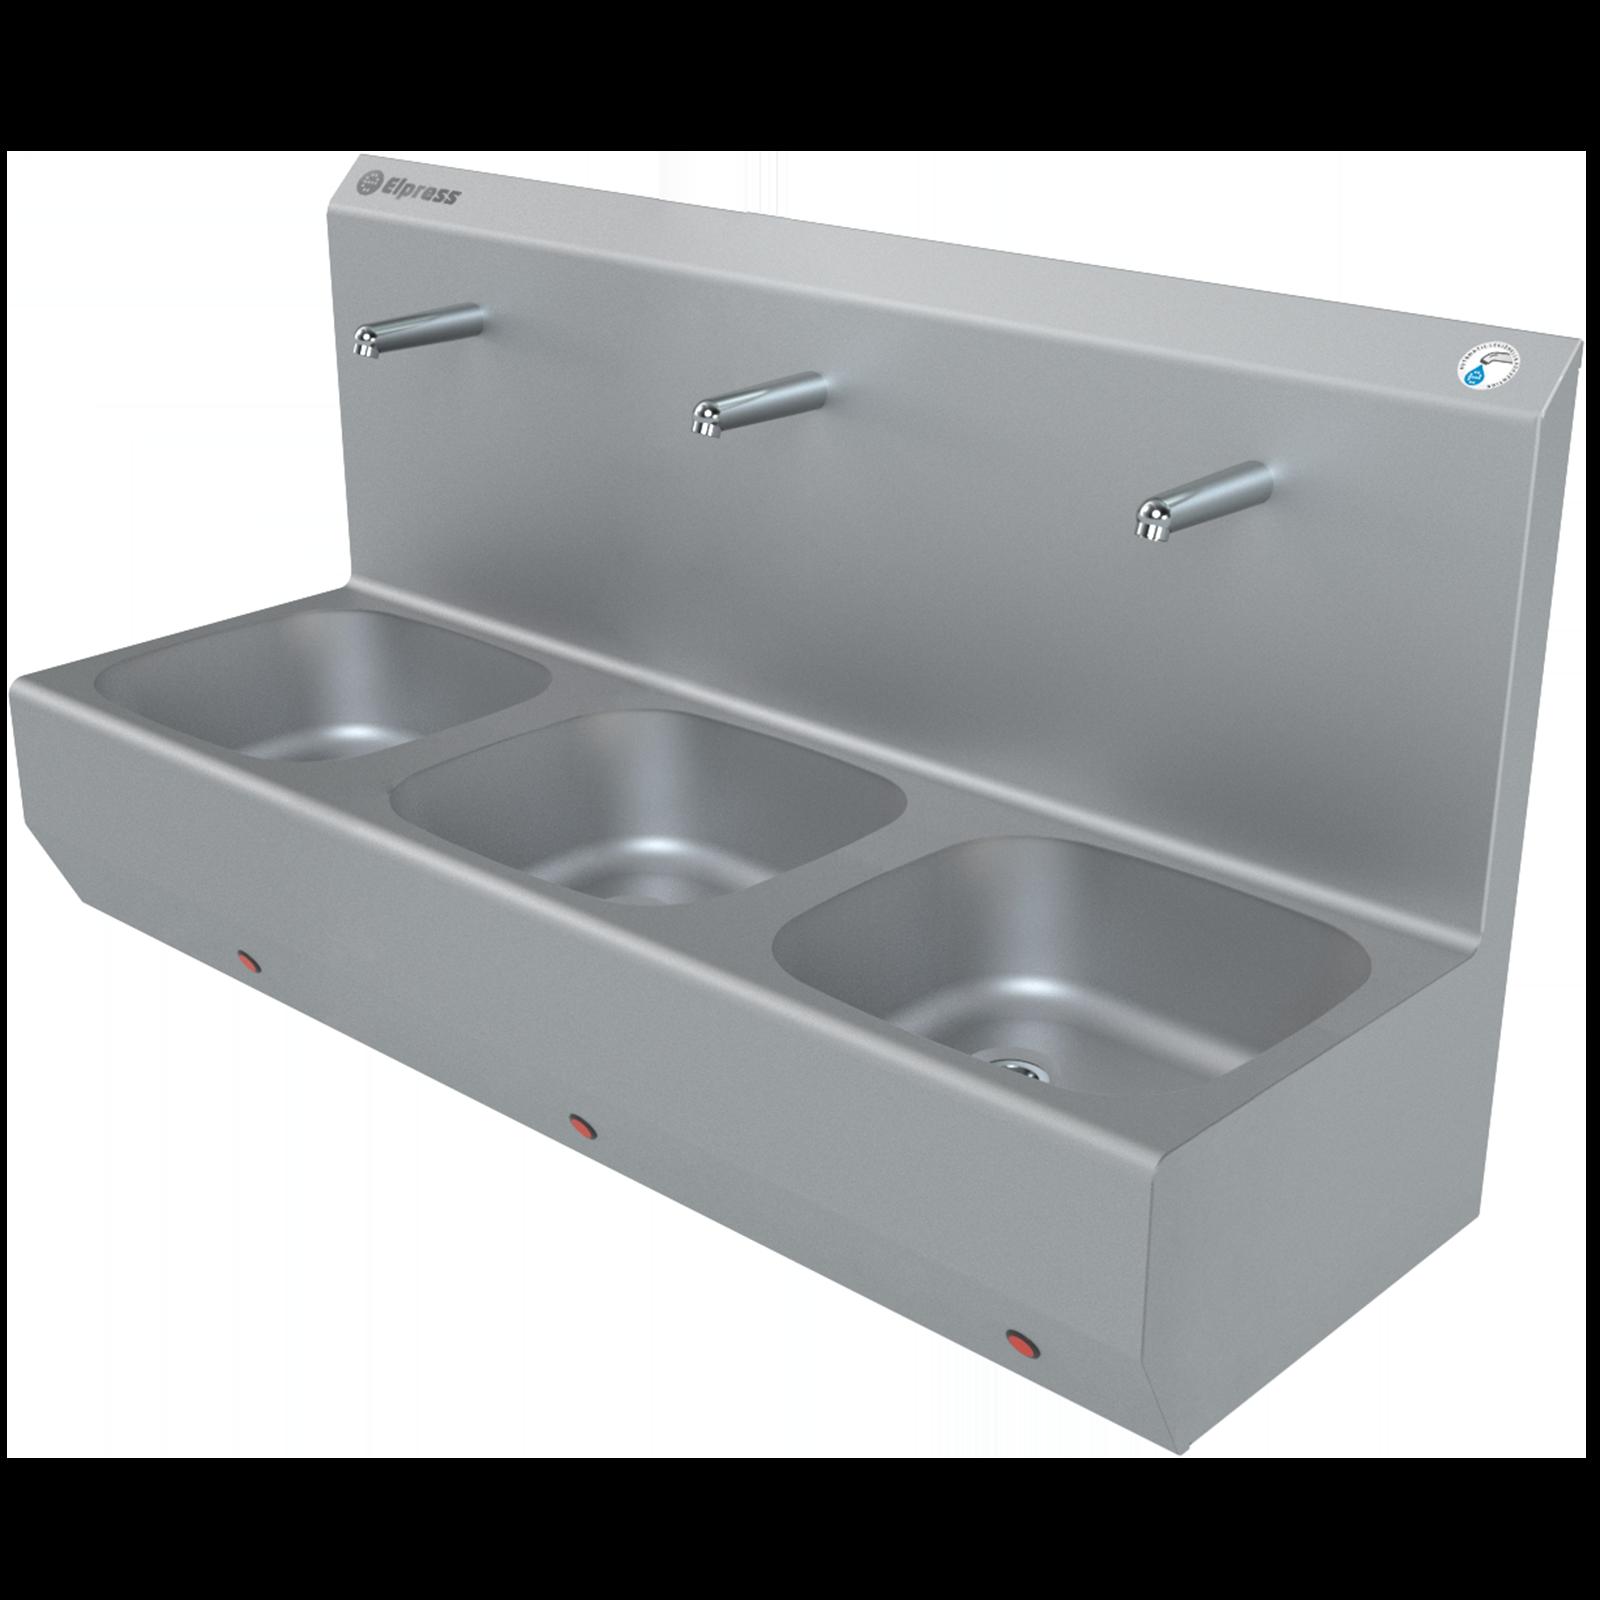 Wash basin - EWG-3S-Deluxe